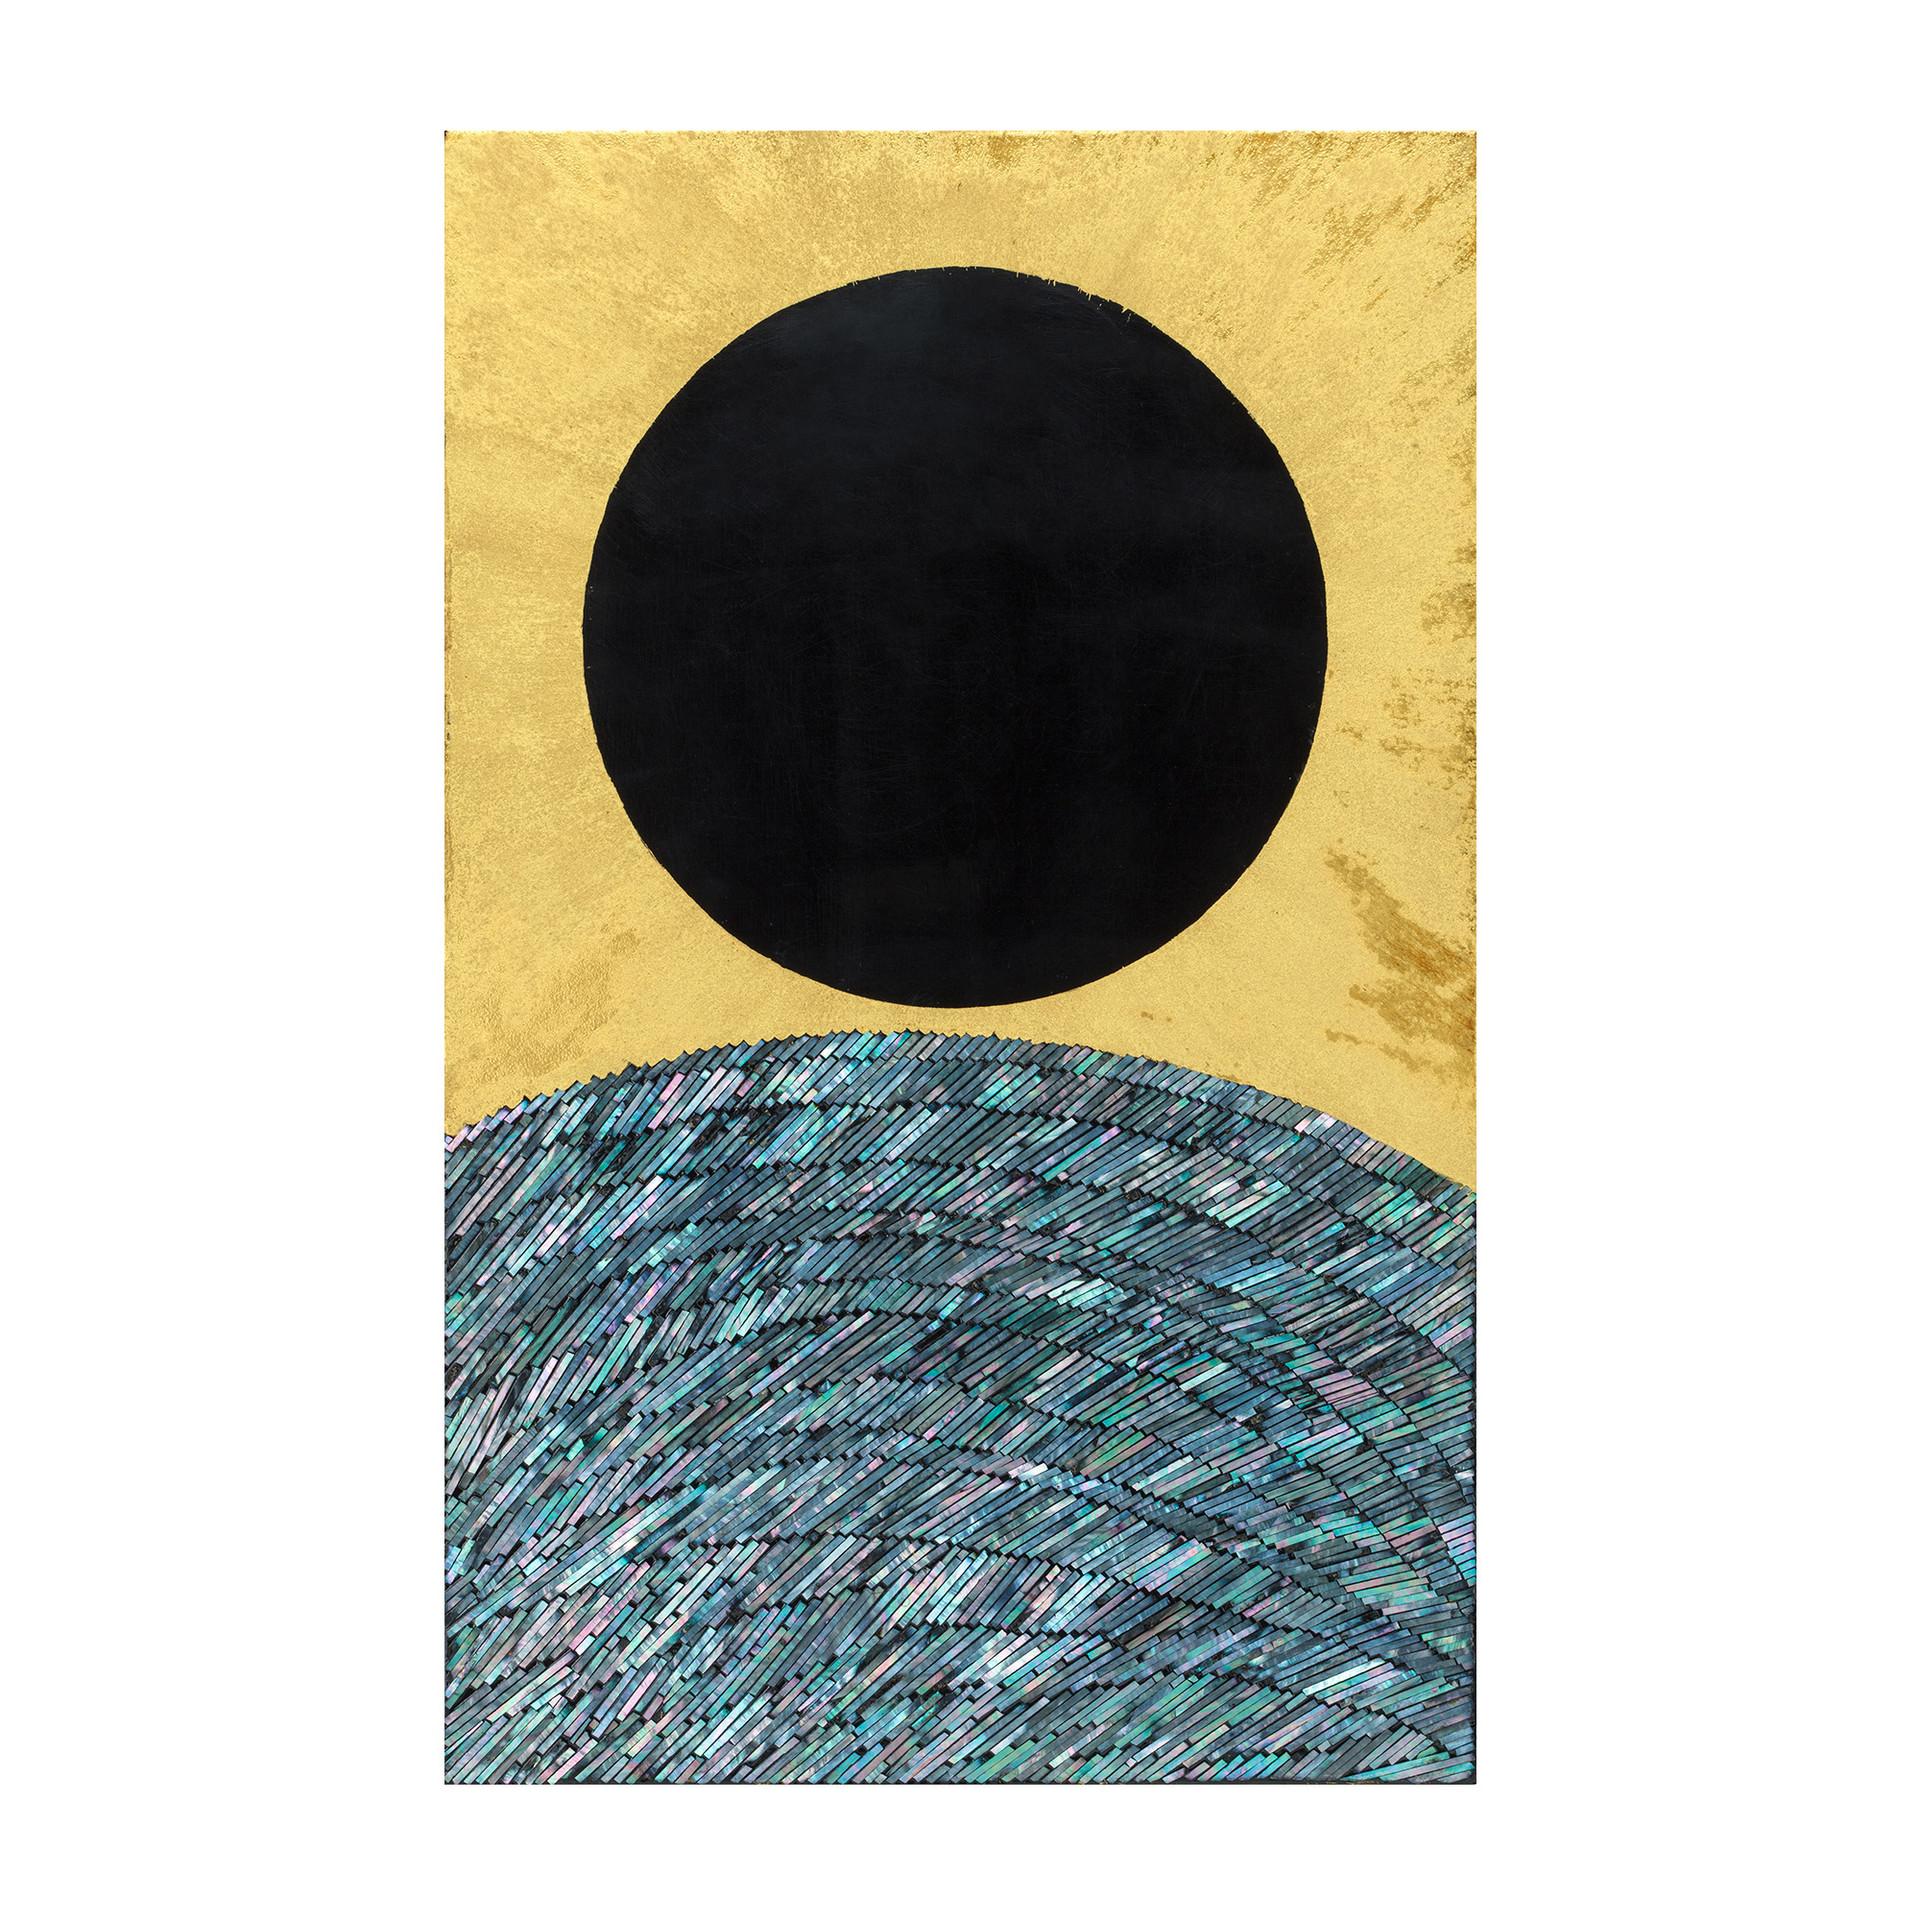 8 series _ Black Moon